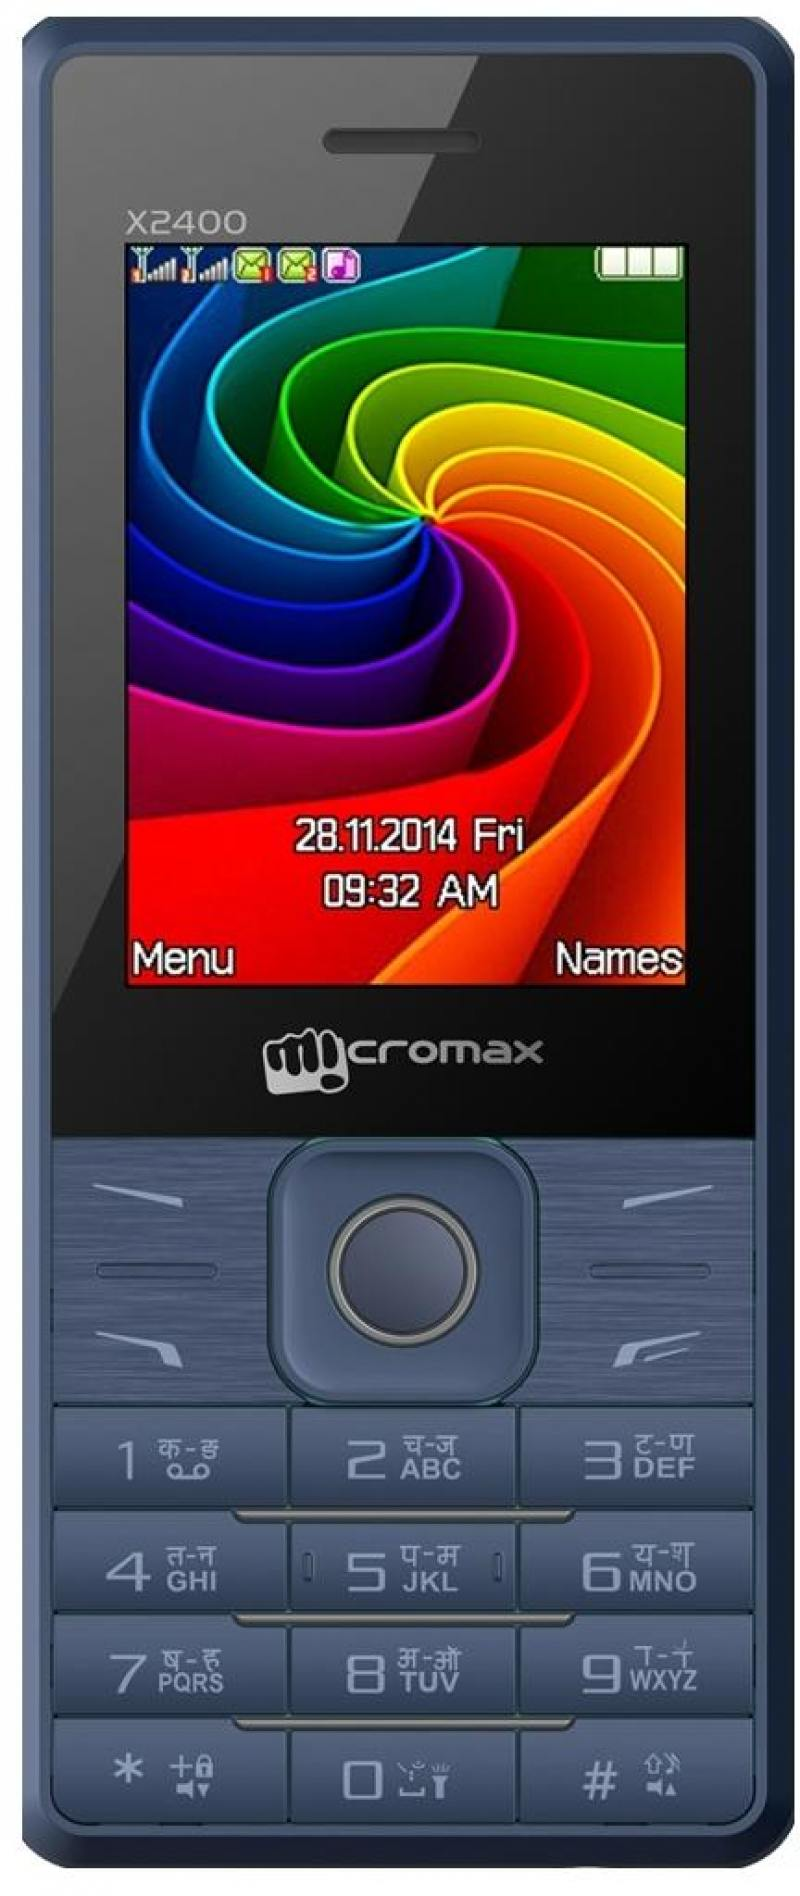 Мобильный телефон Micromax X2400 синий 2.4